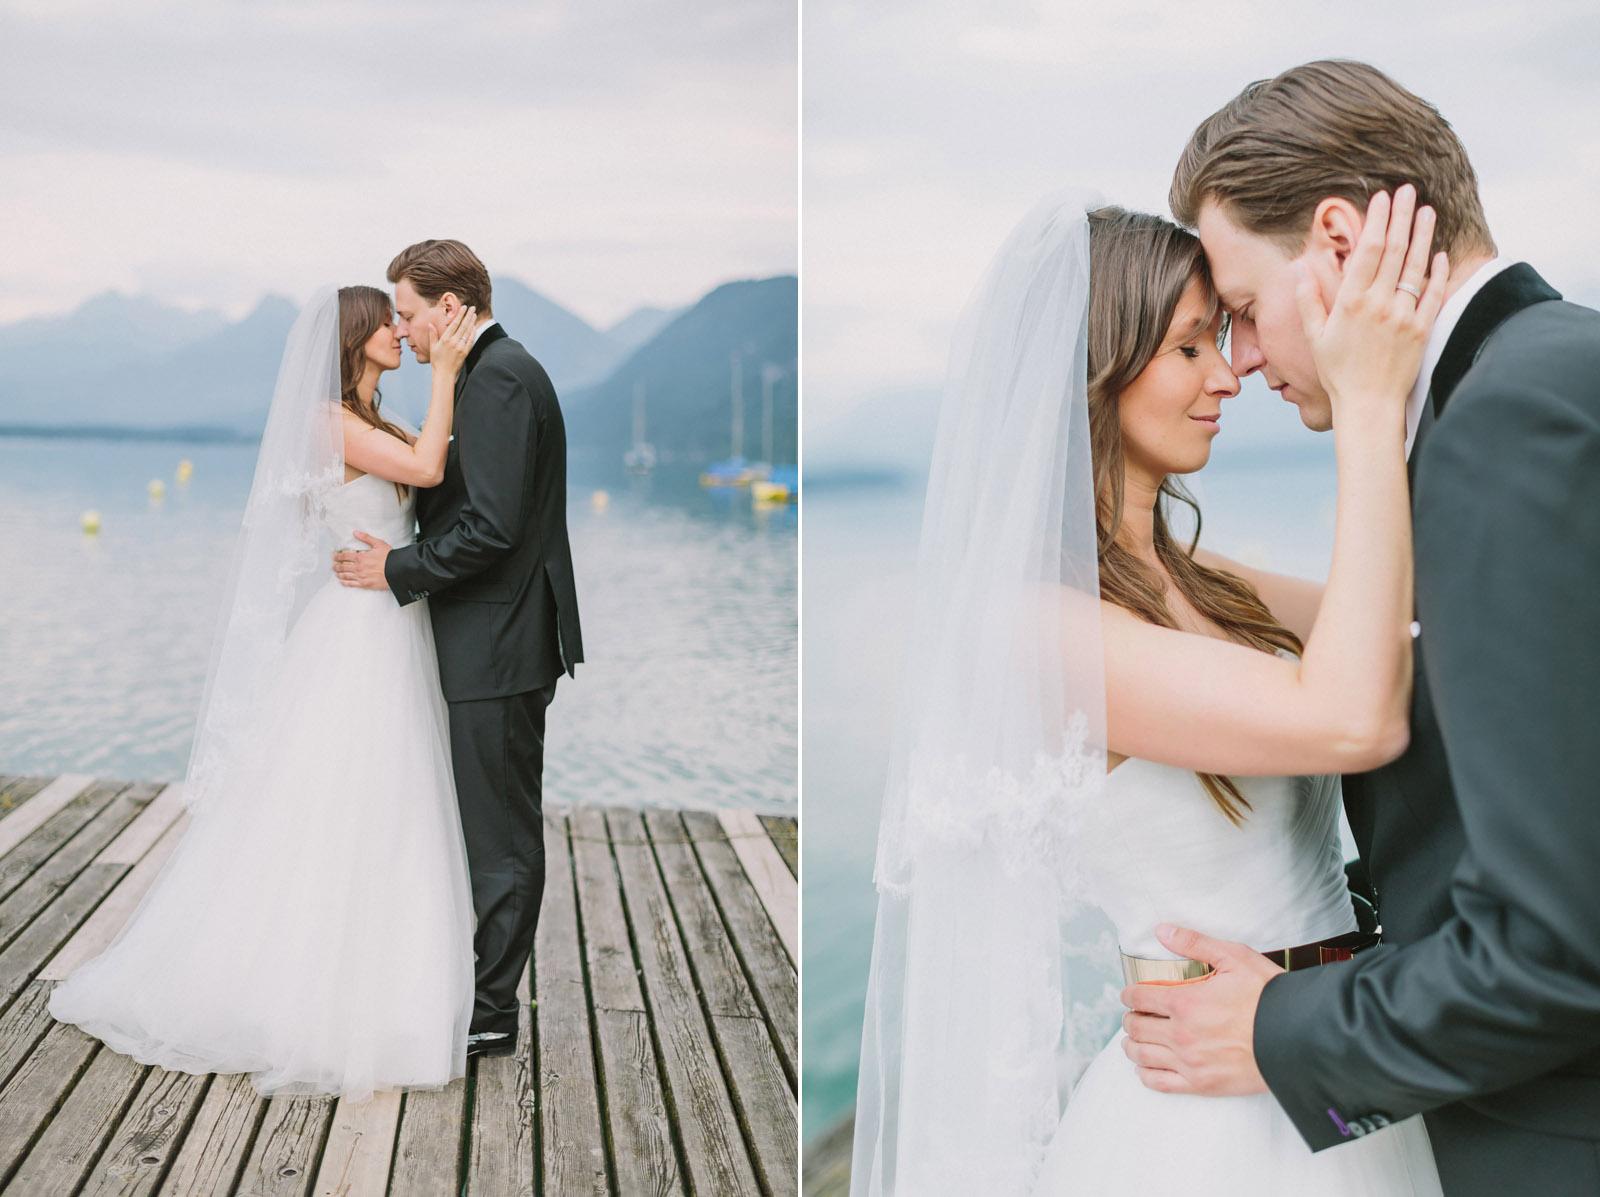 027-wedding-photographer-upper-austria